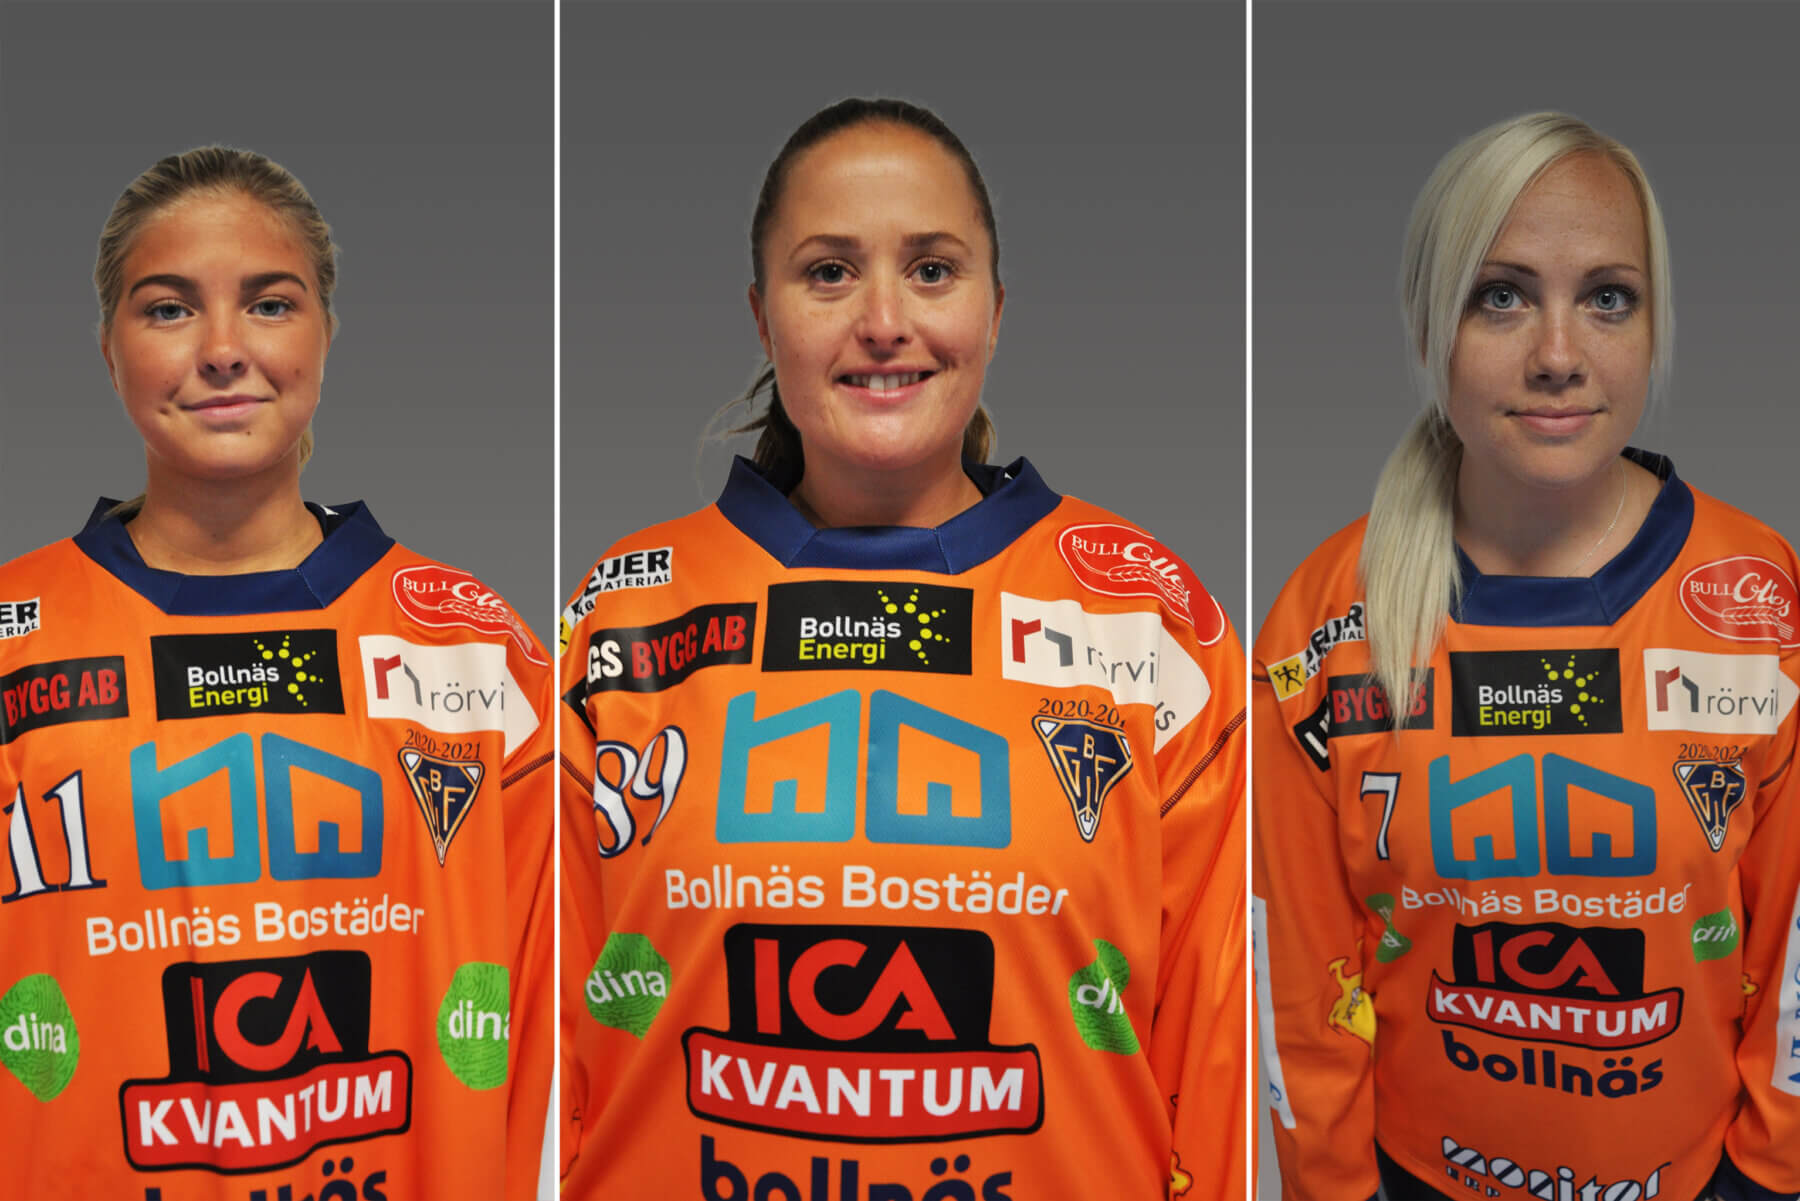 Julia Ekström, Jessica Larsson & Matilda Mattsson